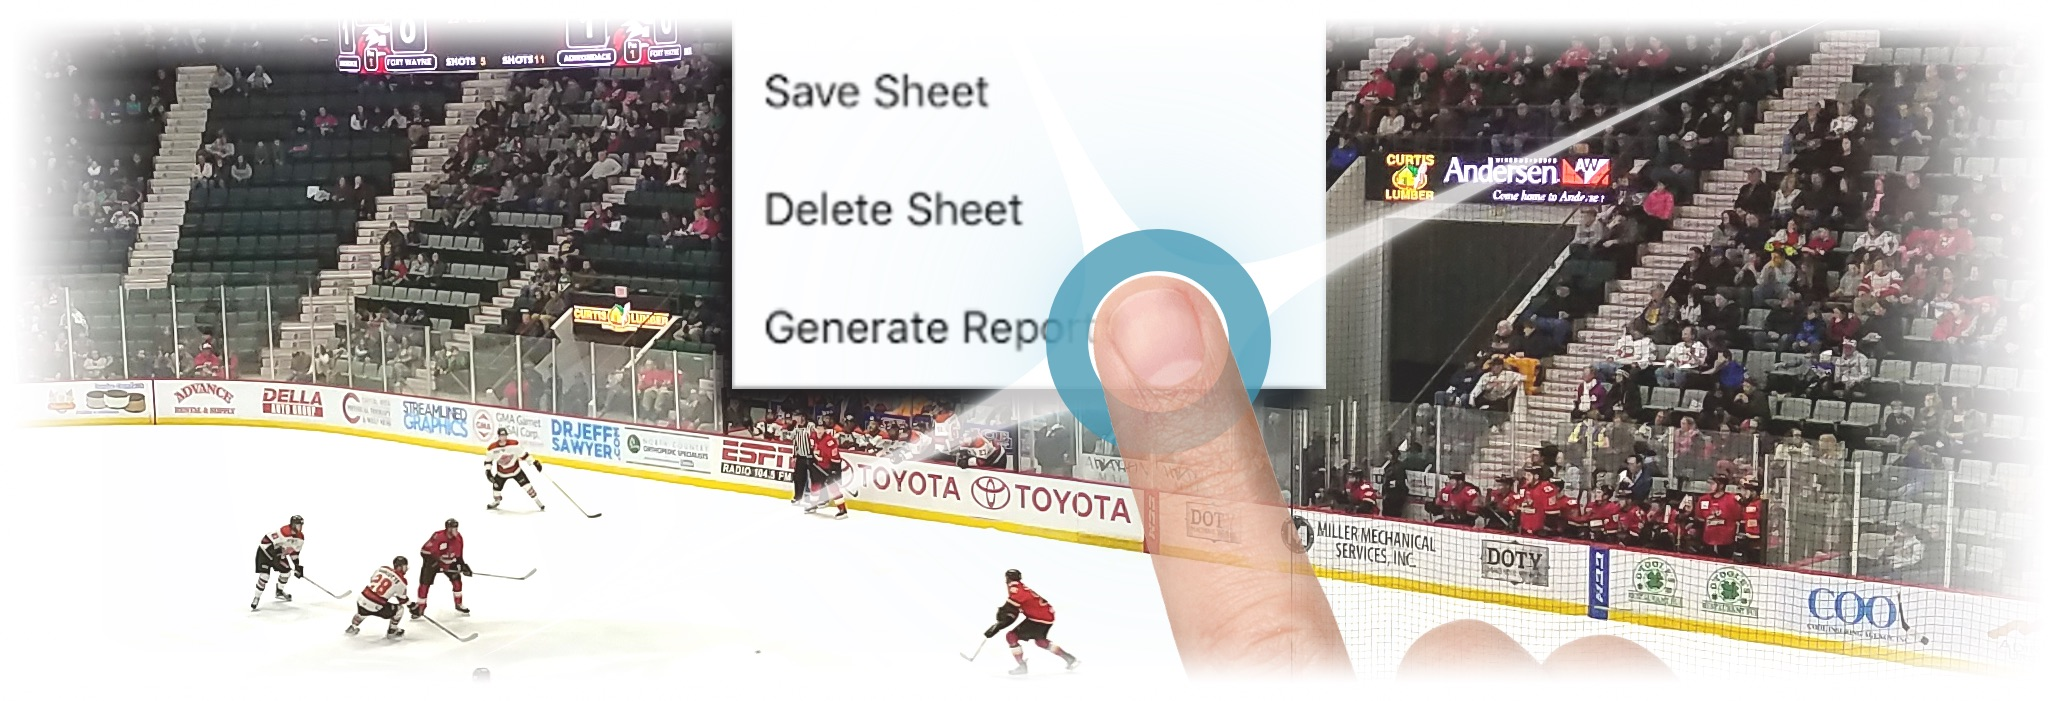 PE-promo-generate-report